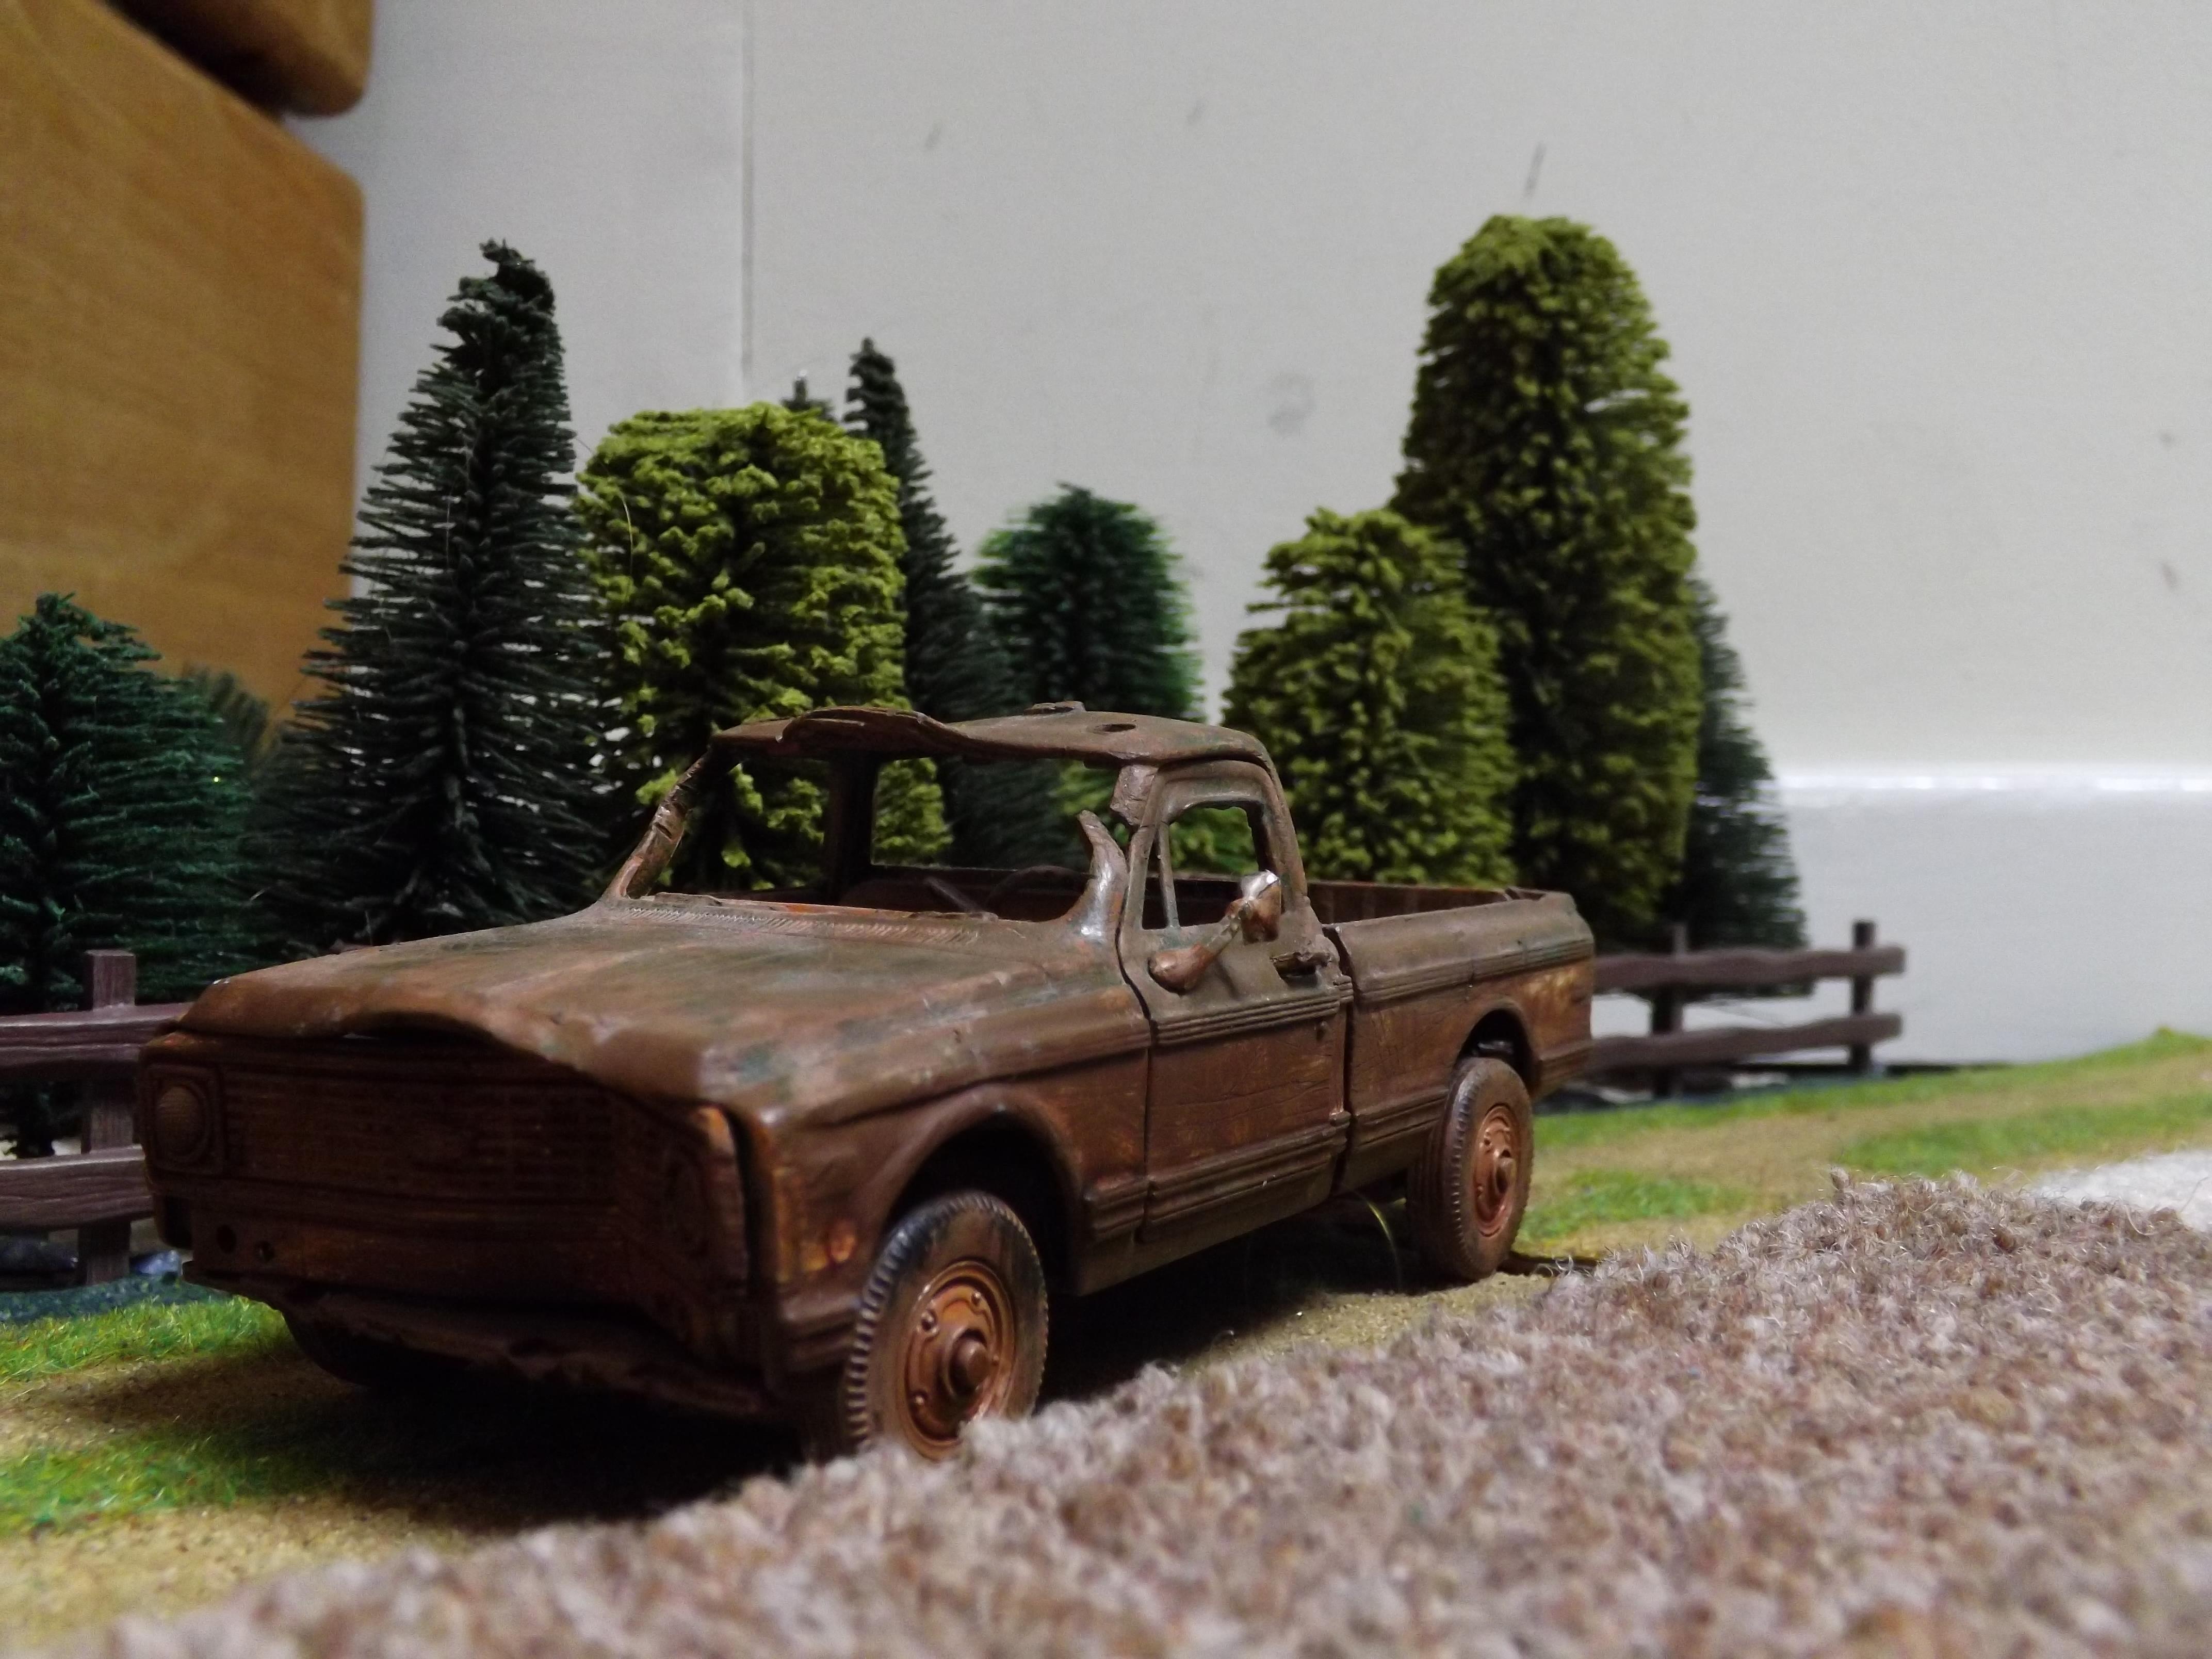 Fire Engine, Lorry, Post Apocalypse, Truck, Vehicle